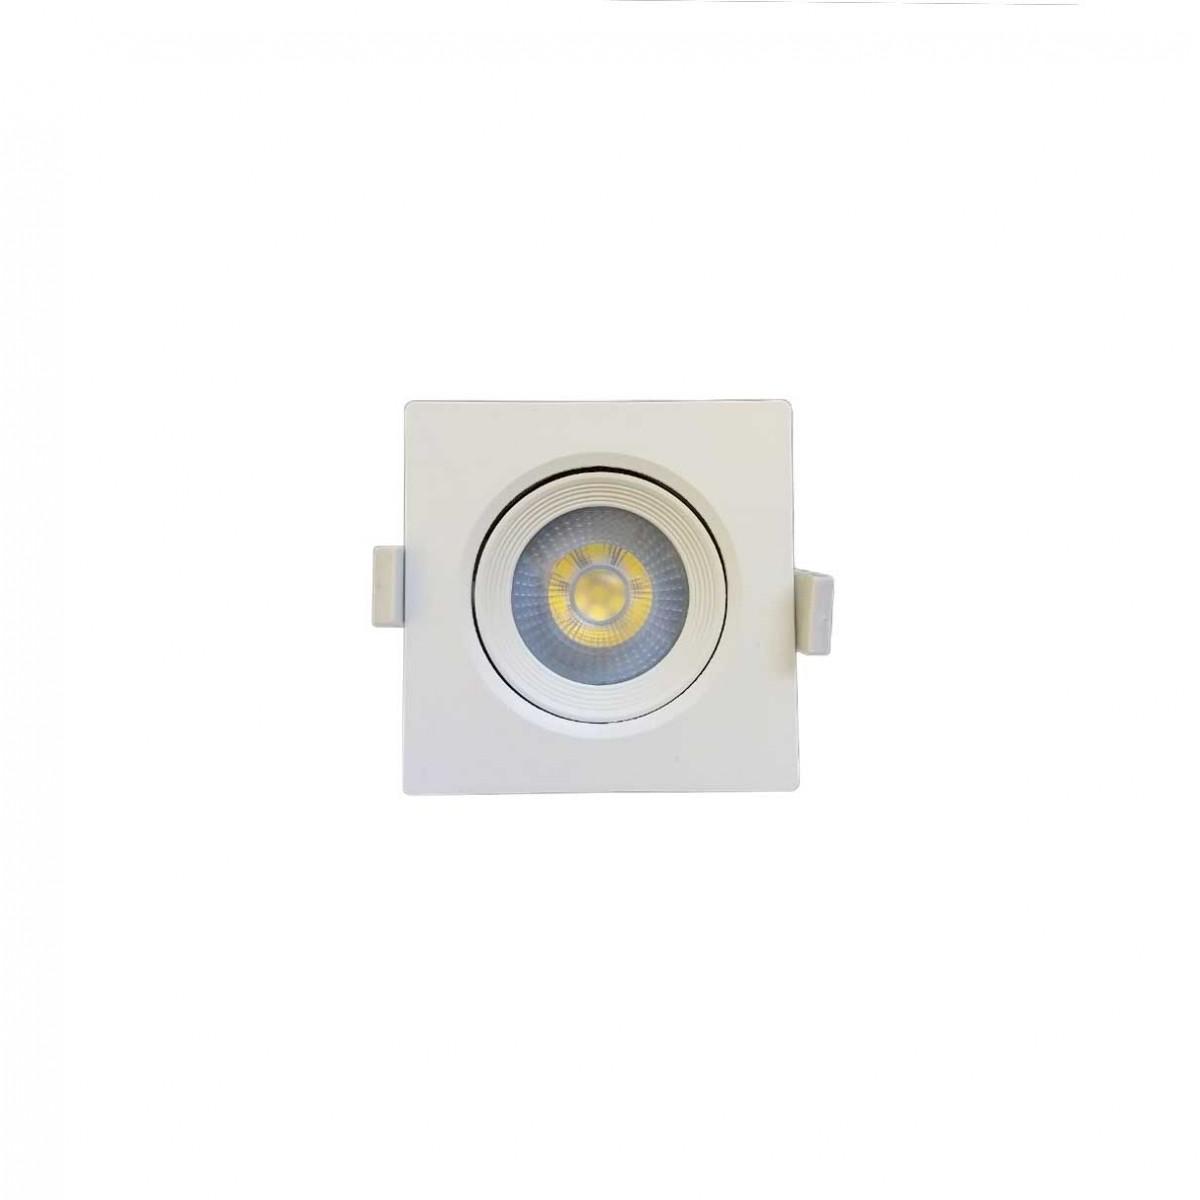 SPOT LED EMBUTIR QUADRADO BRANCO 5W 6500K EMBU LED